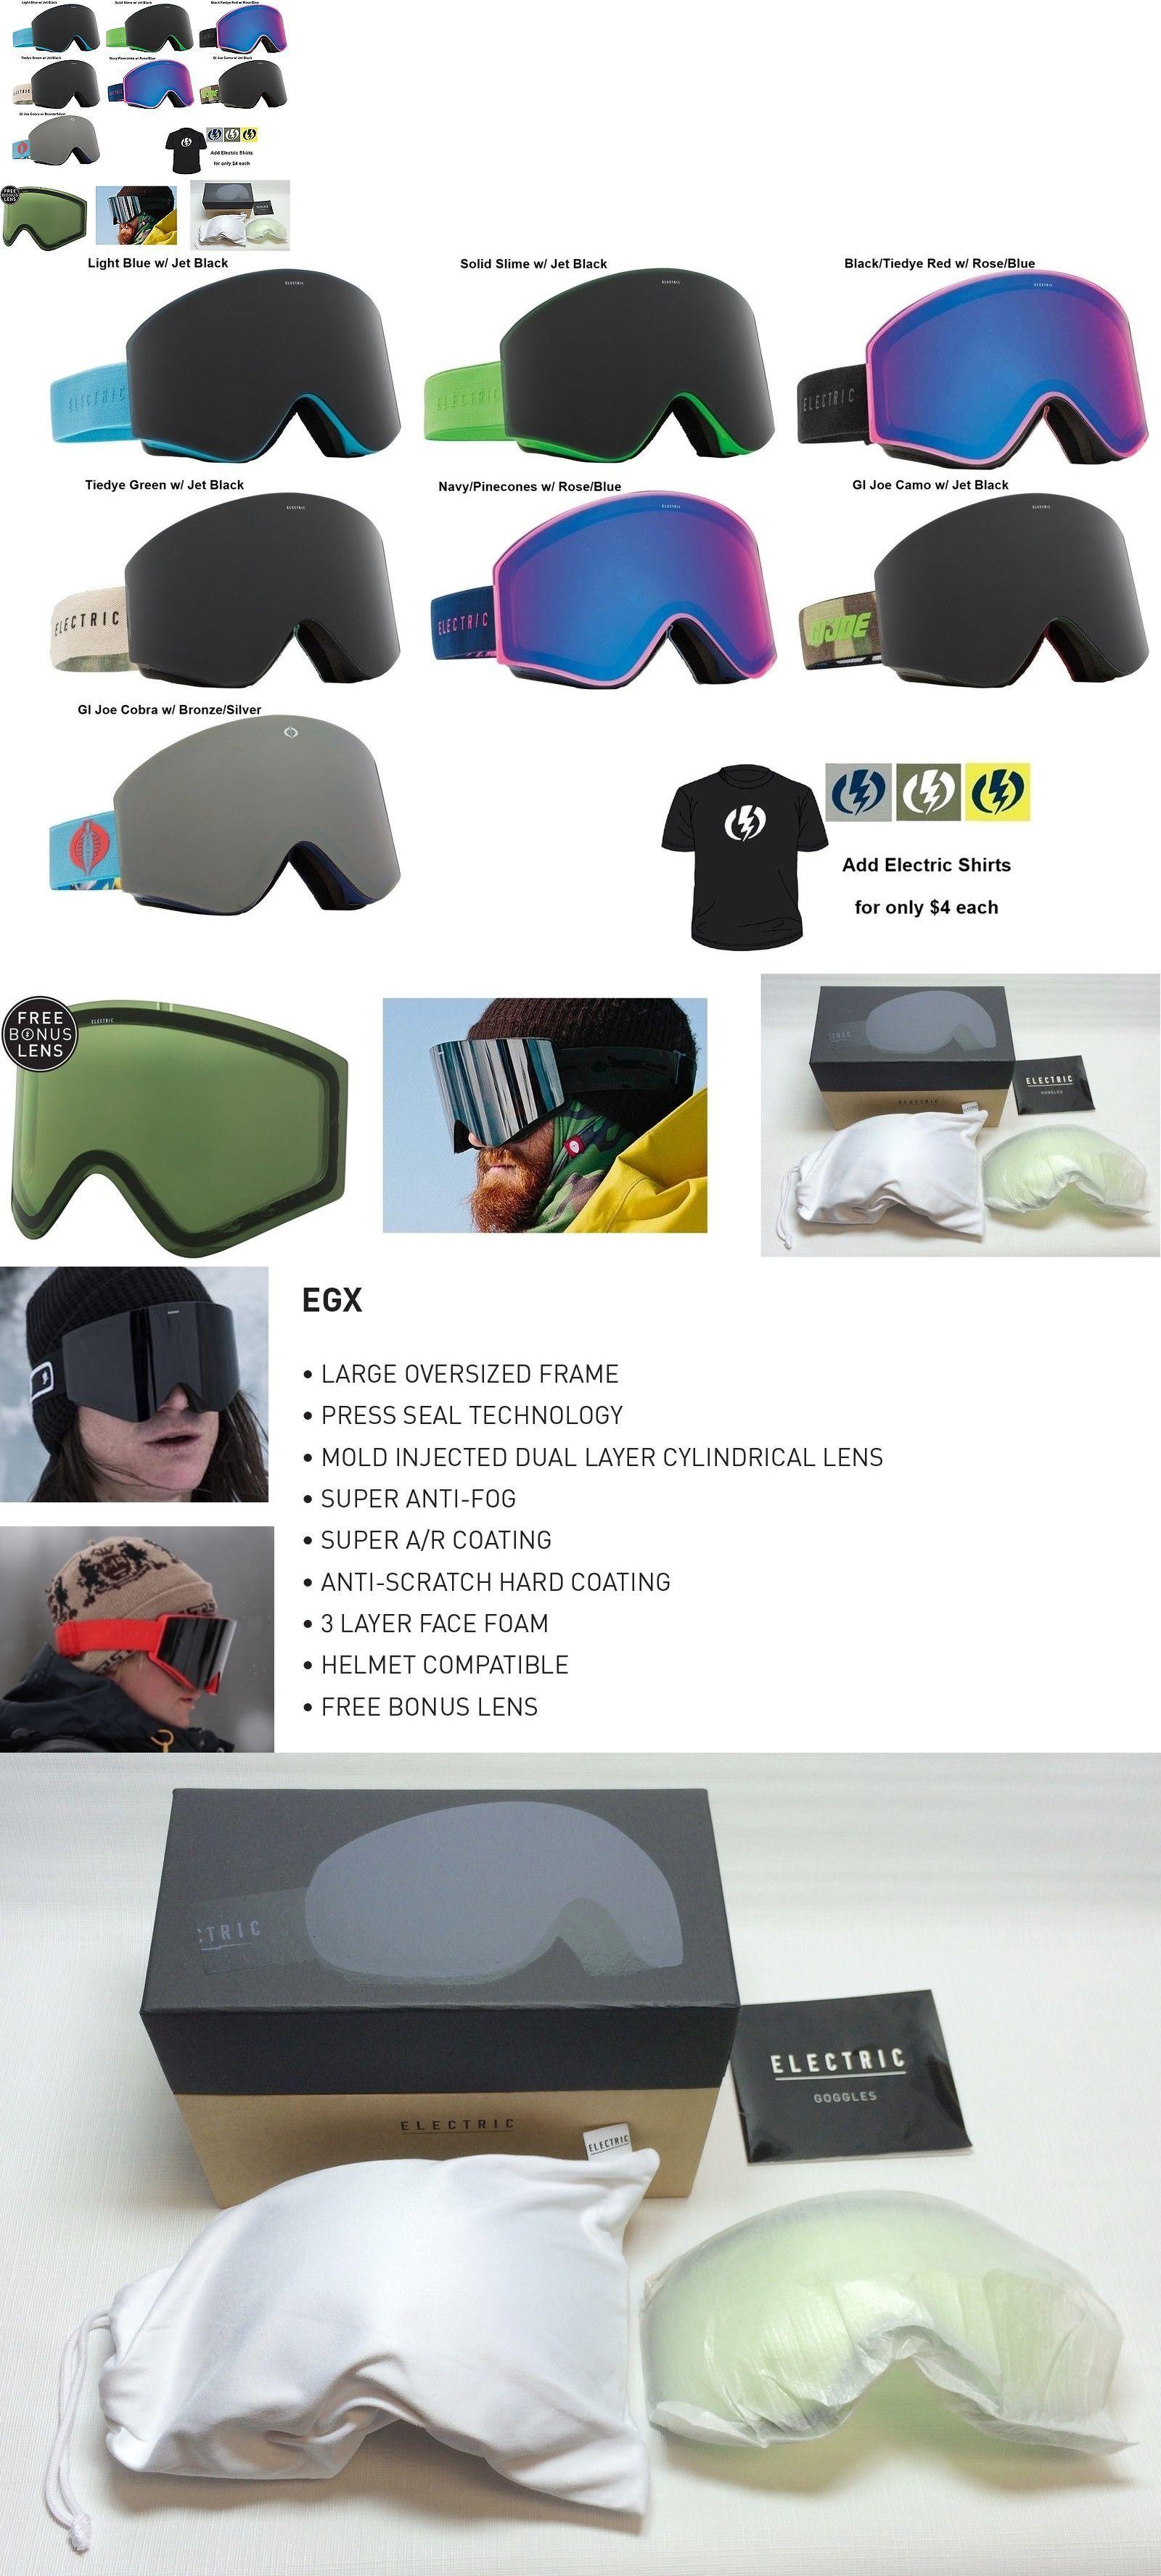 3e17e89be651 Goggles and Sunglasses 21230  New Electric Egx Mens Frameless Ski Snowboard  Goggles + Lens 2016